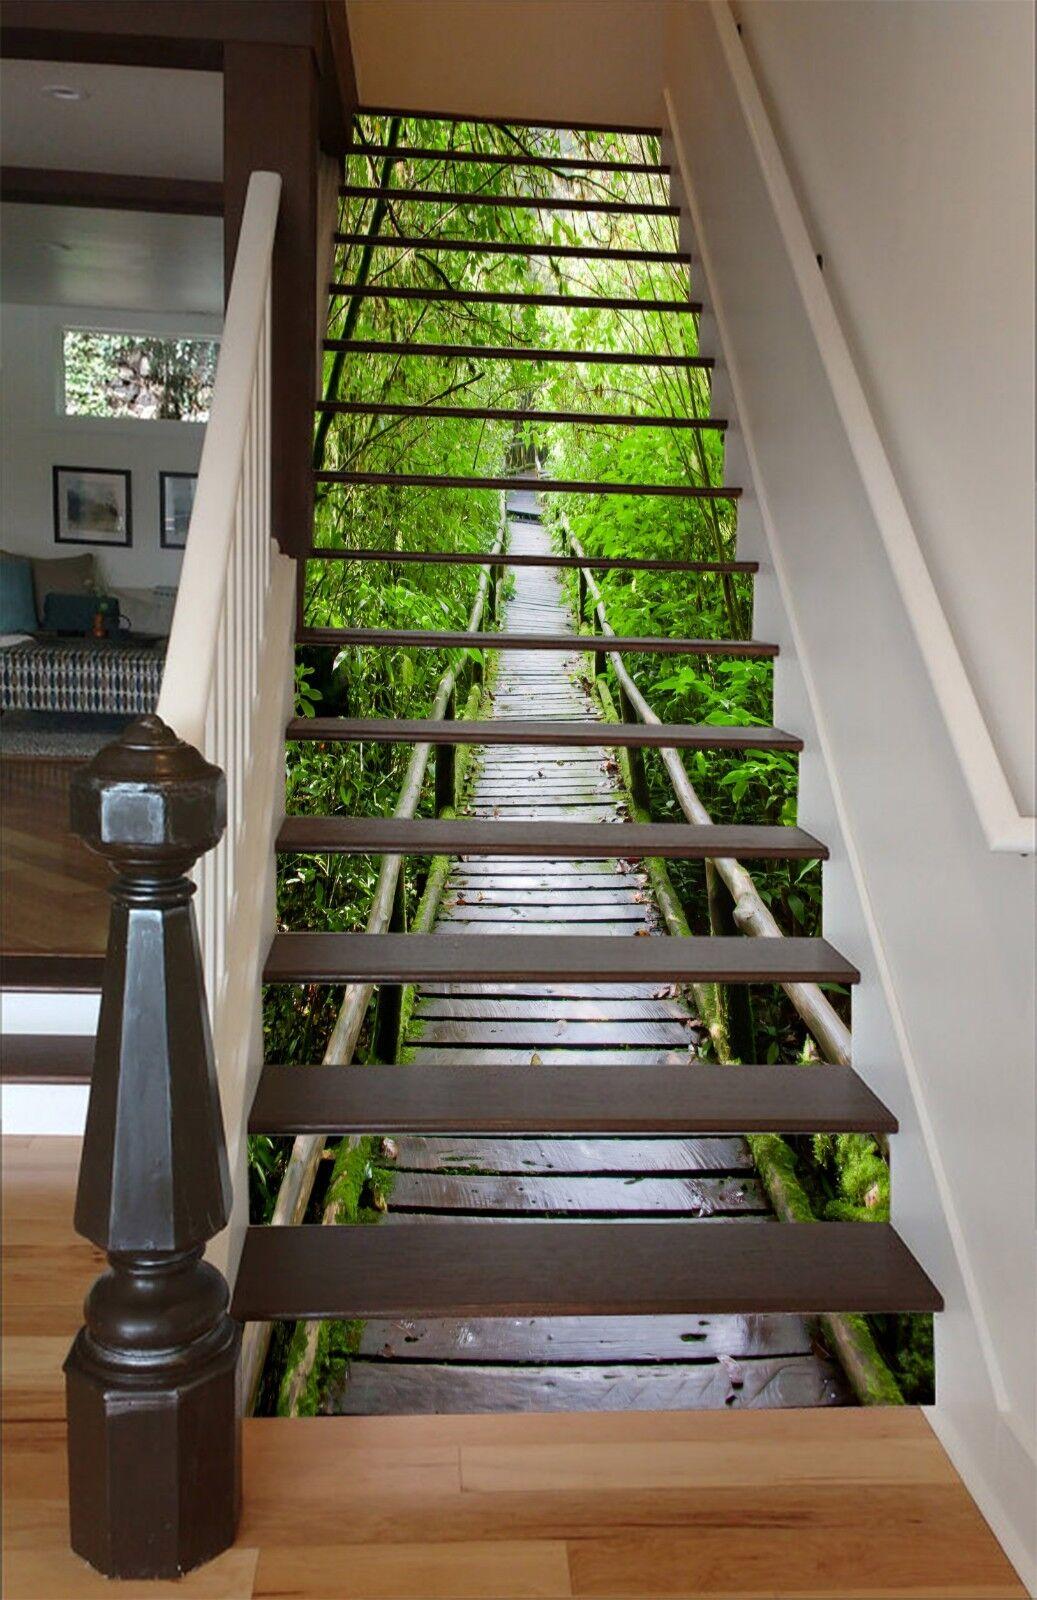 3D Trees Bridge 29 Stair Risers Decoration Photo Mural Vinyl Decal Wallpaper CA